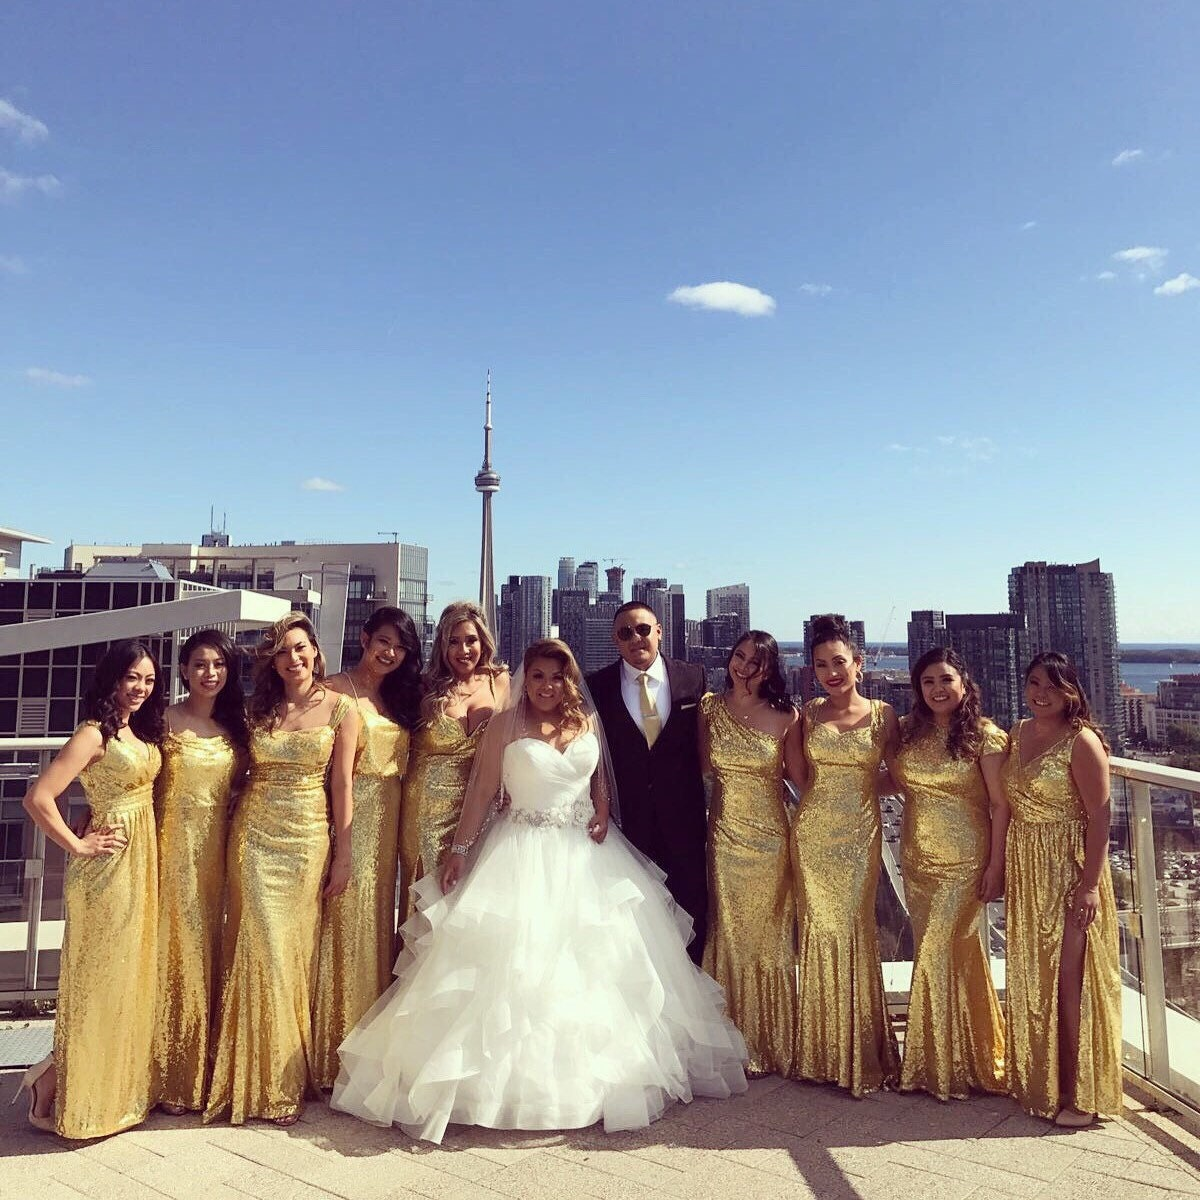 2017 plum velvet bridesmaid dress v neck wedding dress, Badezimmer ideen